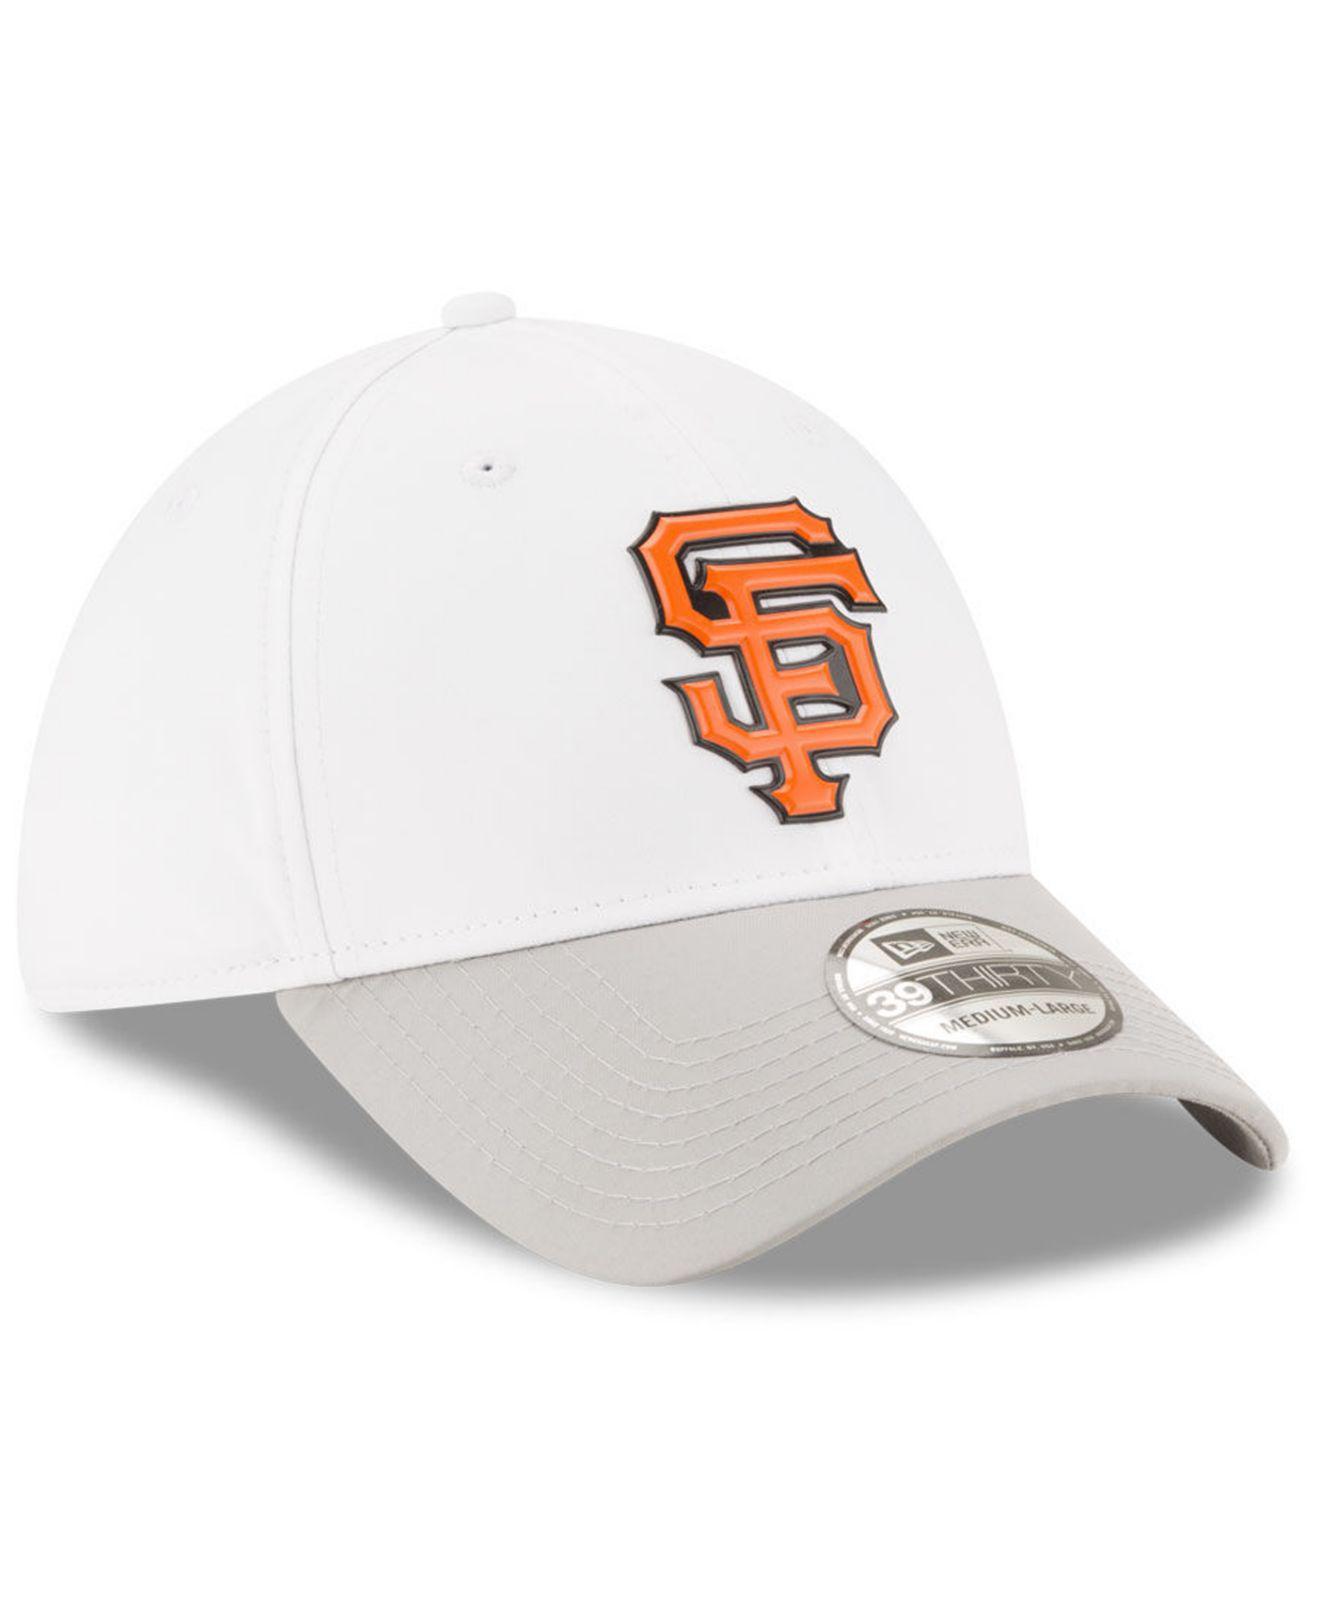 1fb95794a78e5 wholesale white batting practice 39thirty cap for men lyst. view fullscreen  8b990 89070